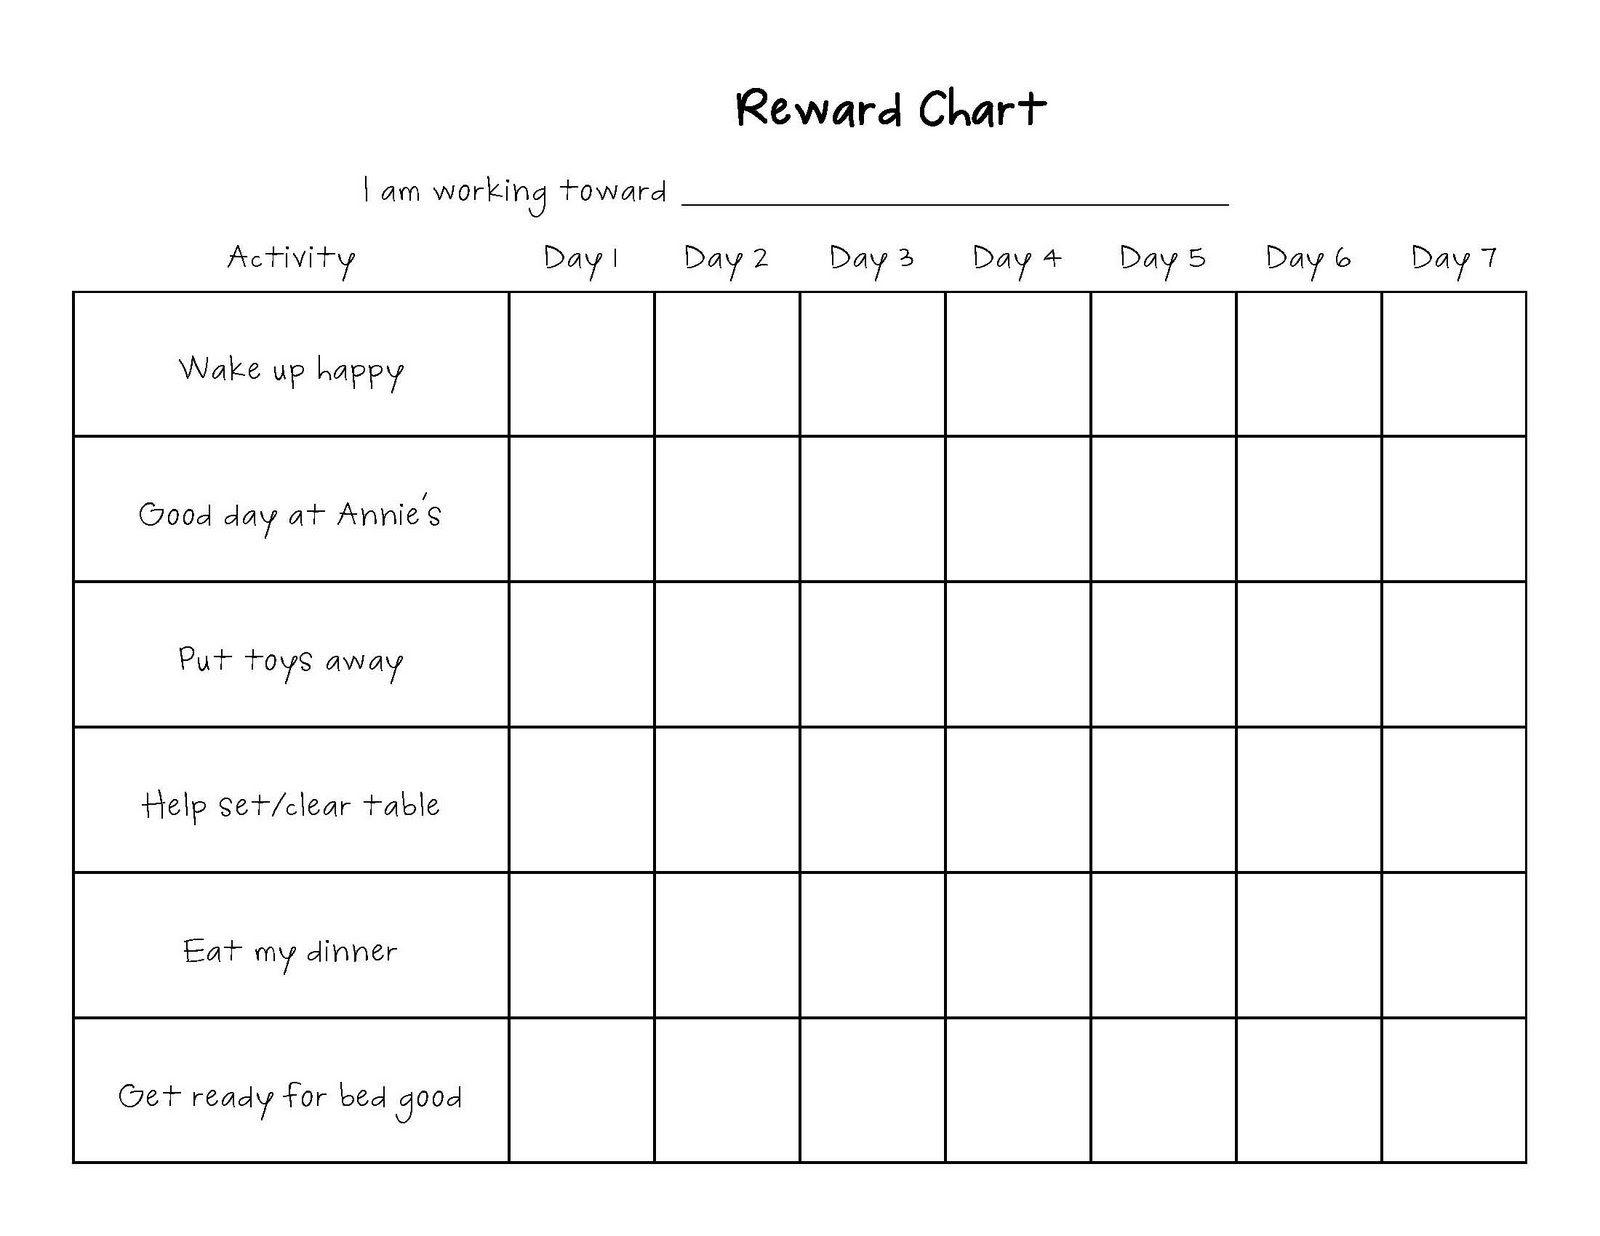 Template for reward chart kendi charlasmotivacionales co